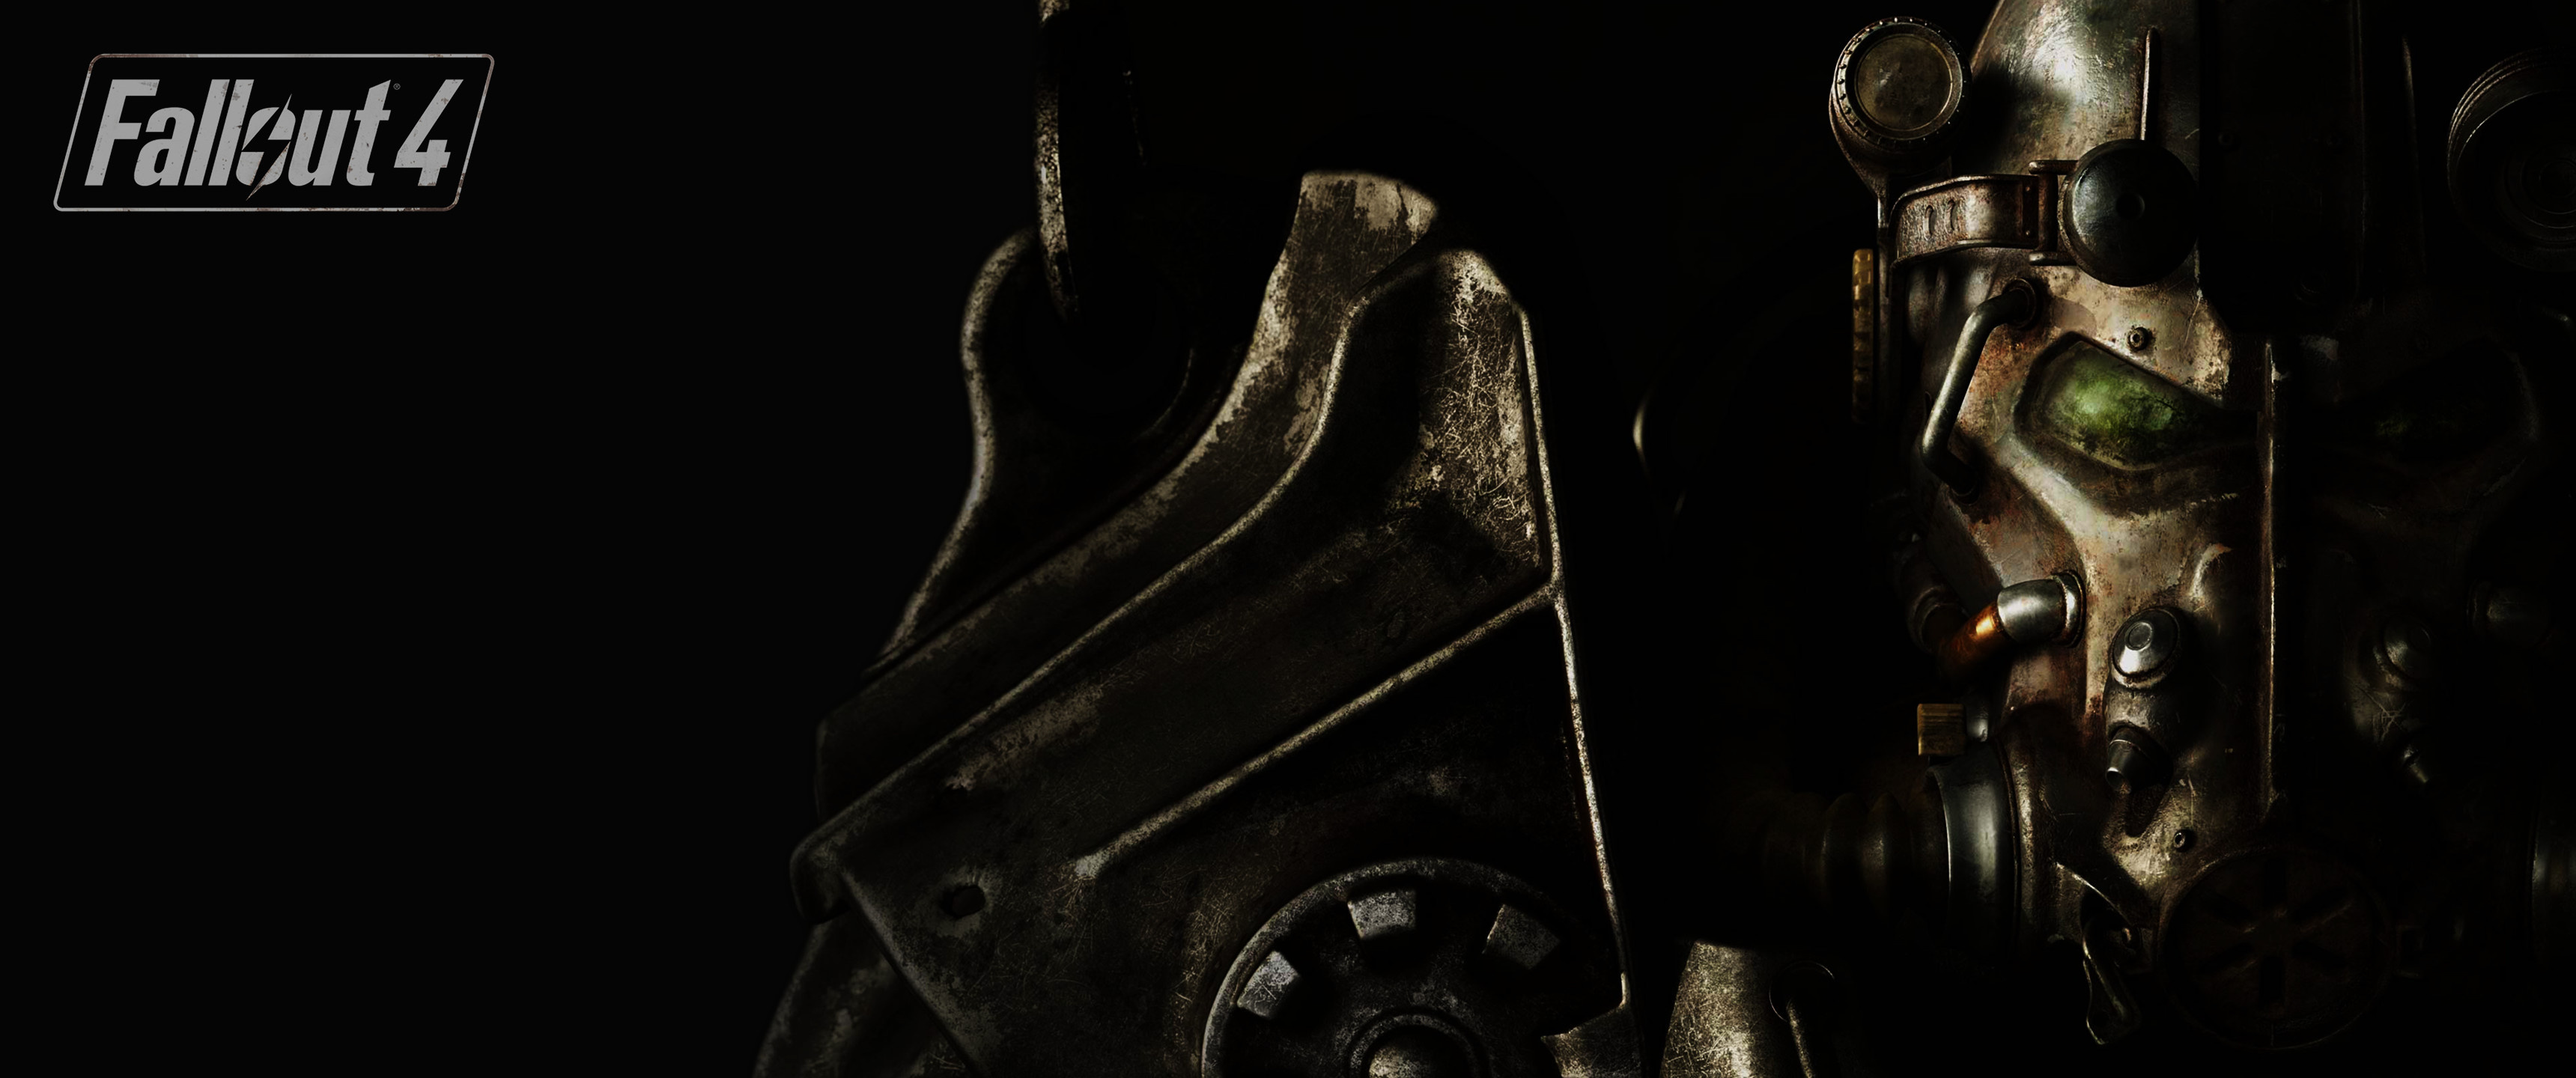 Fallout 4 3440×1440